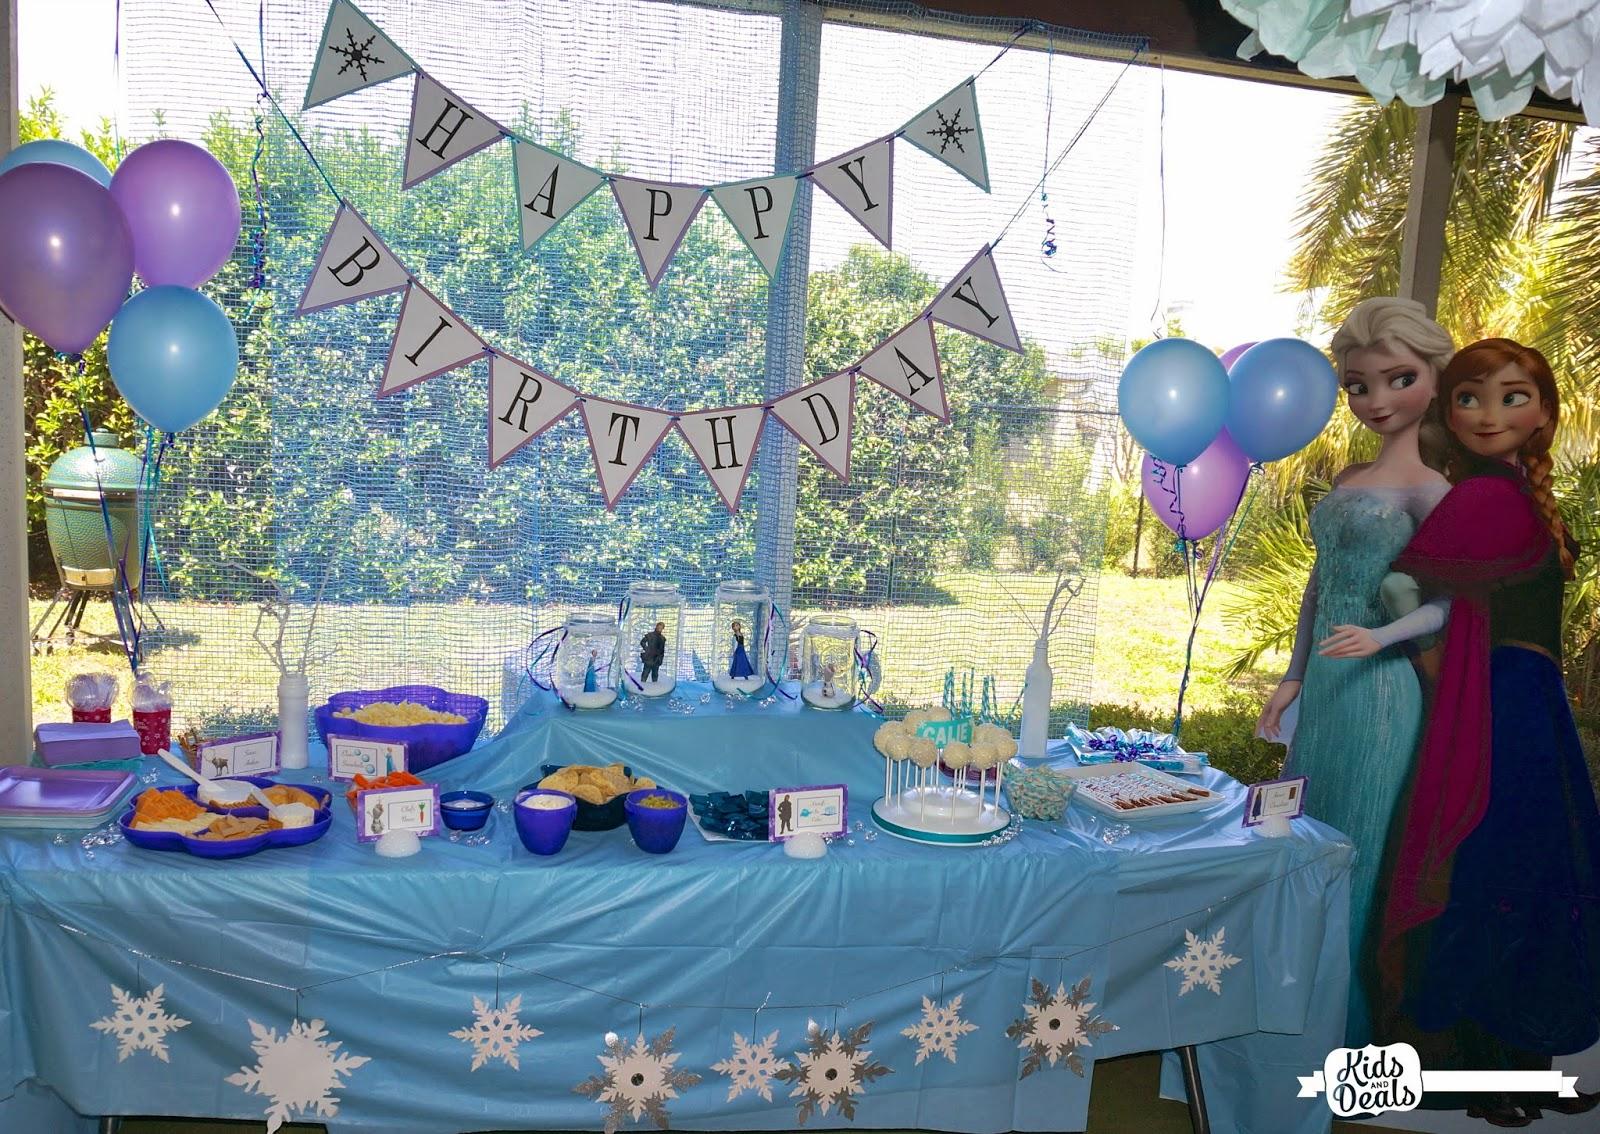 Kids and Deals: Disney Frozen Birthday Party